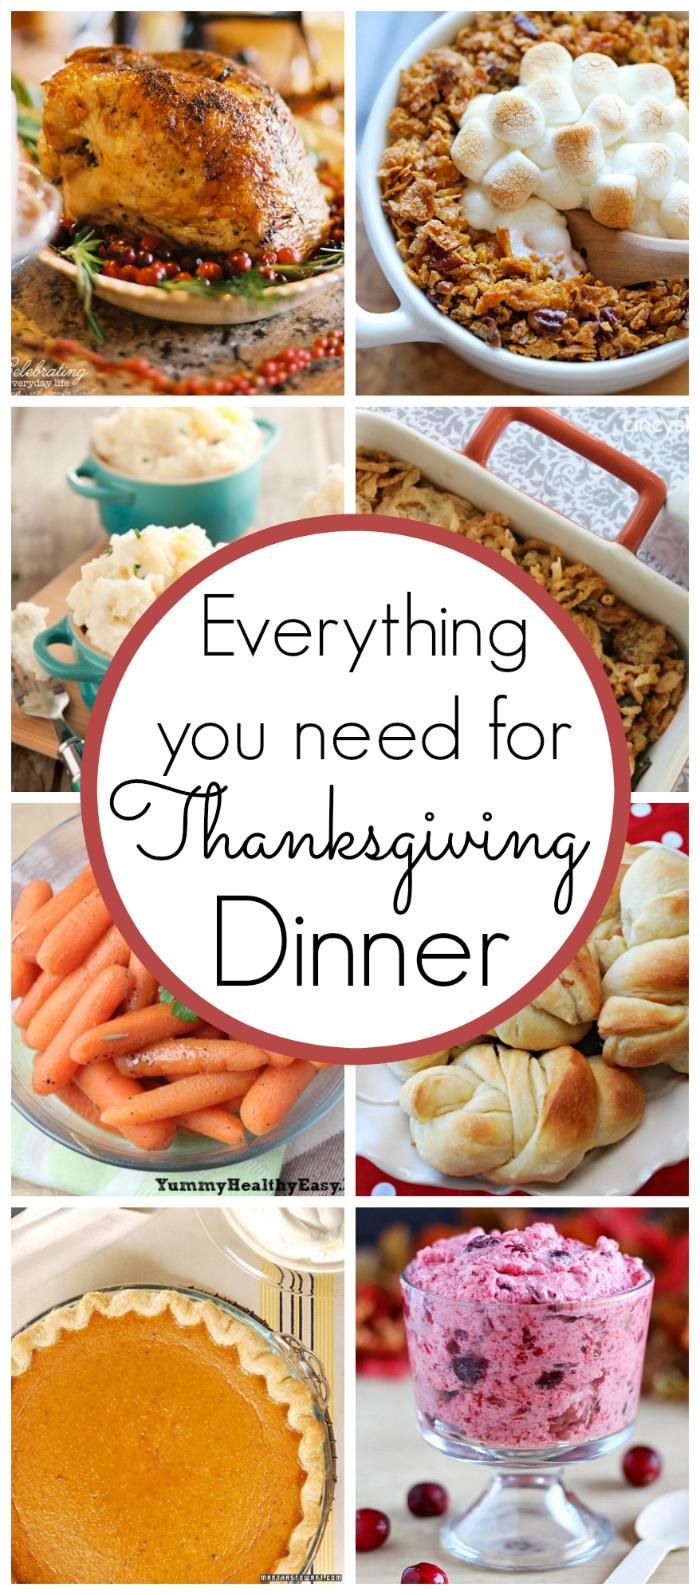 Recipes For Thanksgiving Dinner  Thanksgiving Dinner Recipes